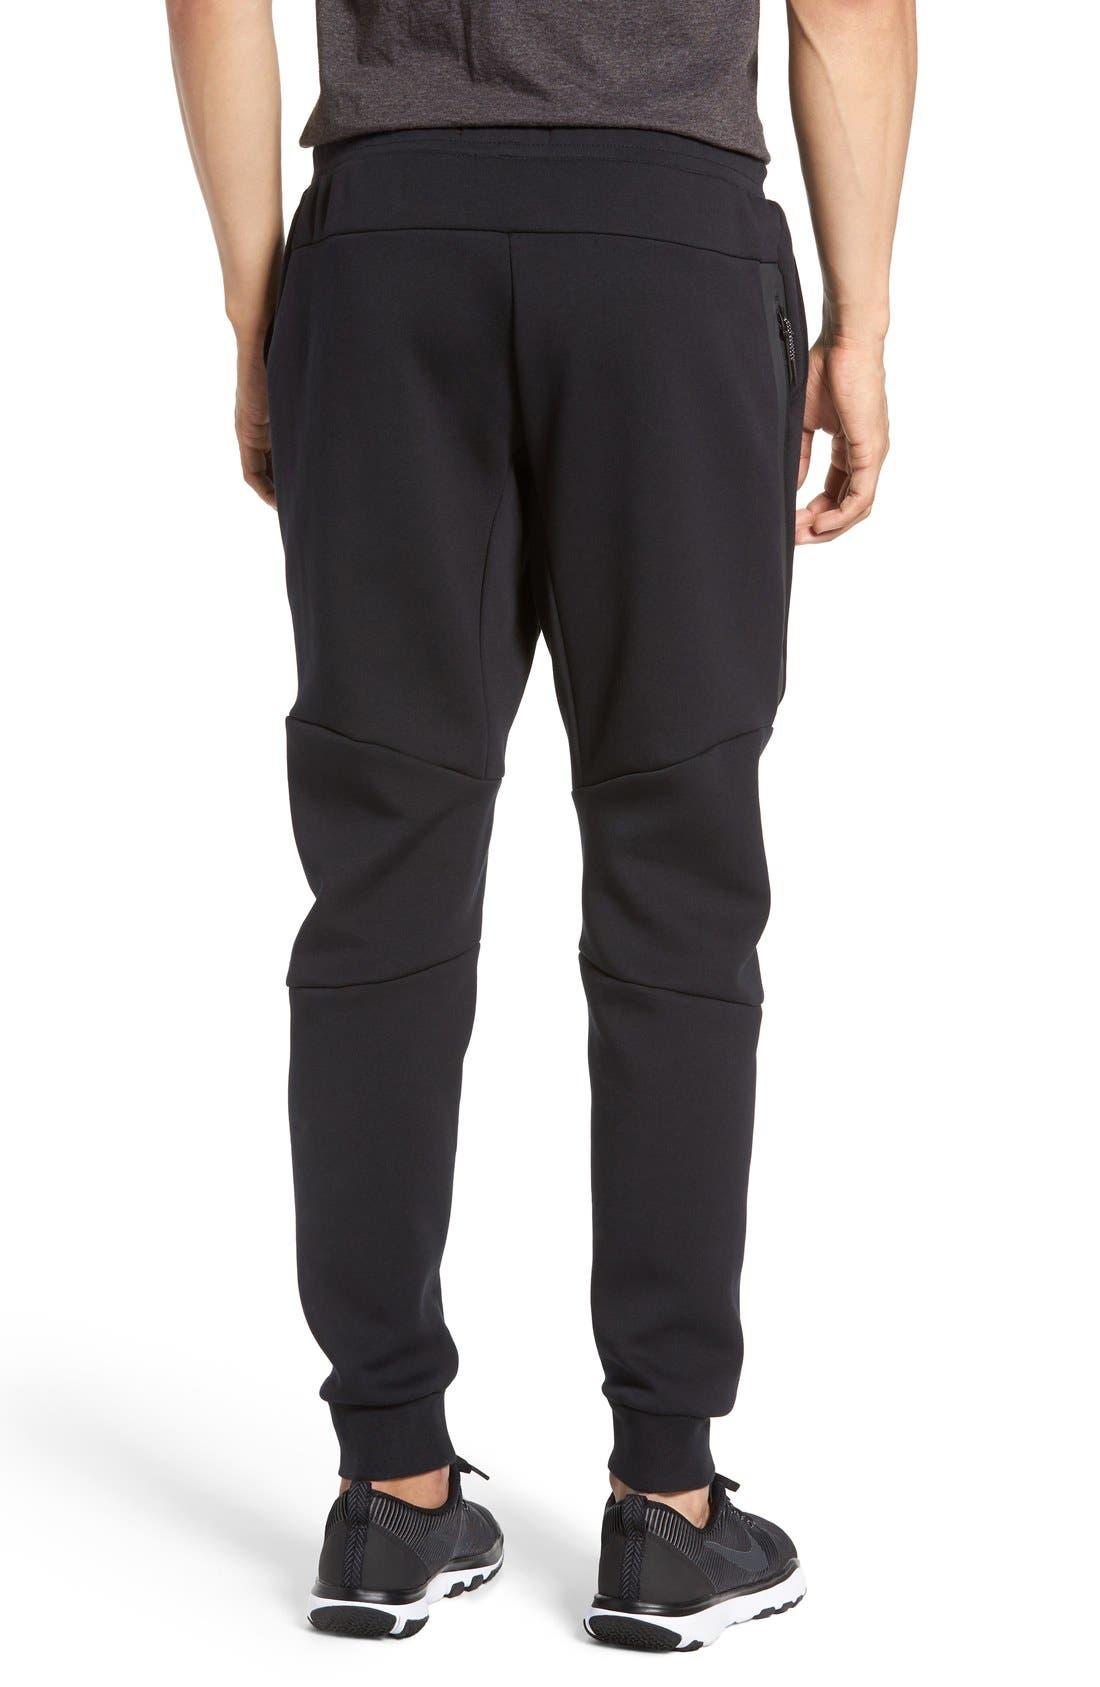 Tech Fleece Jogger Pants,                             Alternate thumbnail 3, color,                             Black/ Black